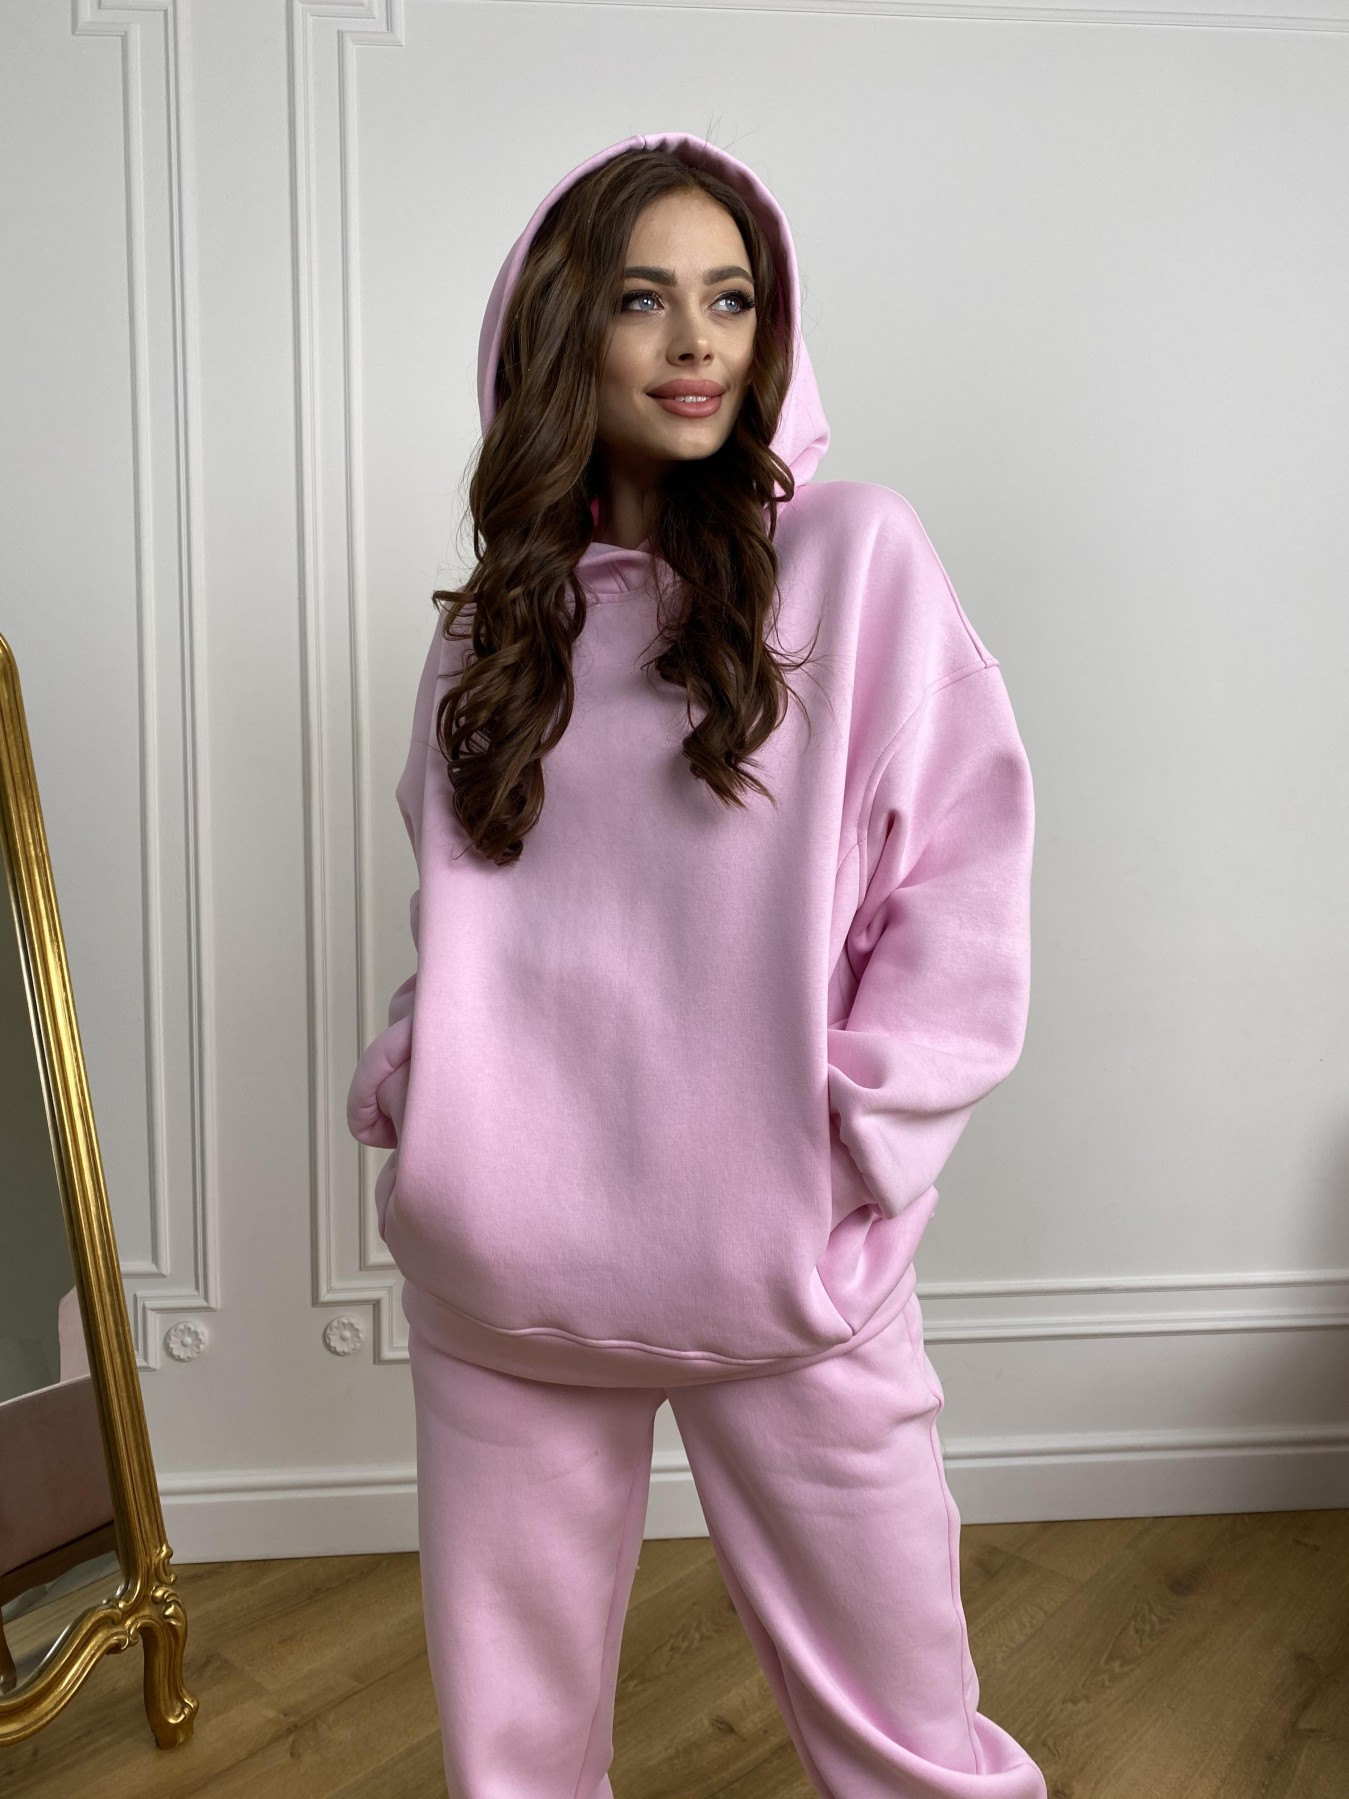 Марион костюм в  стиле Oversize  3х нитка 9651 АРТ. 46922 Цвет: Розовый - фото 2, интернет магазин tm-modus.ru